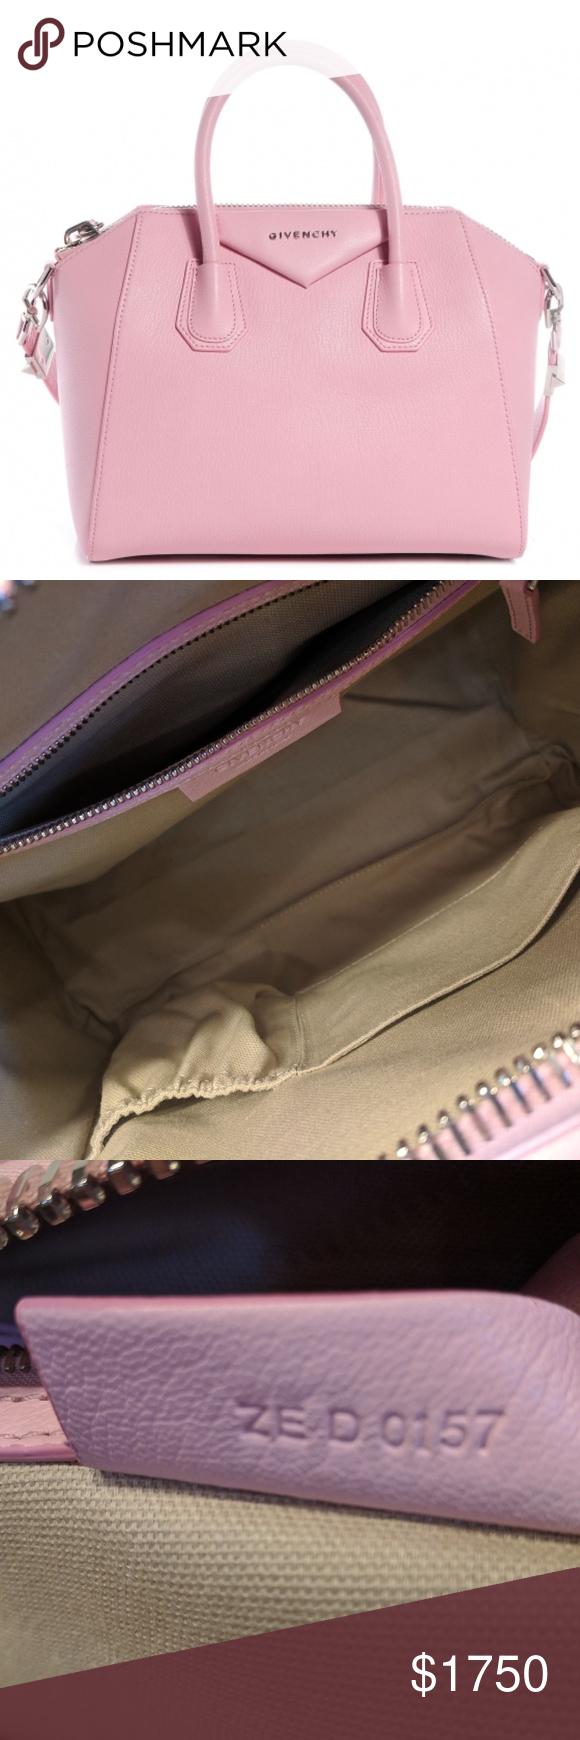 91234ac0536b Shoulder Bag · Givenchy Small Light Pink Antigona Like New This item may  have been worn but has no